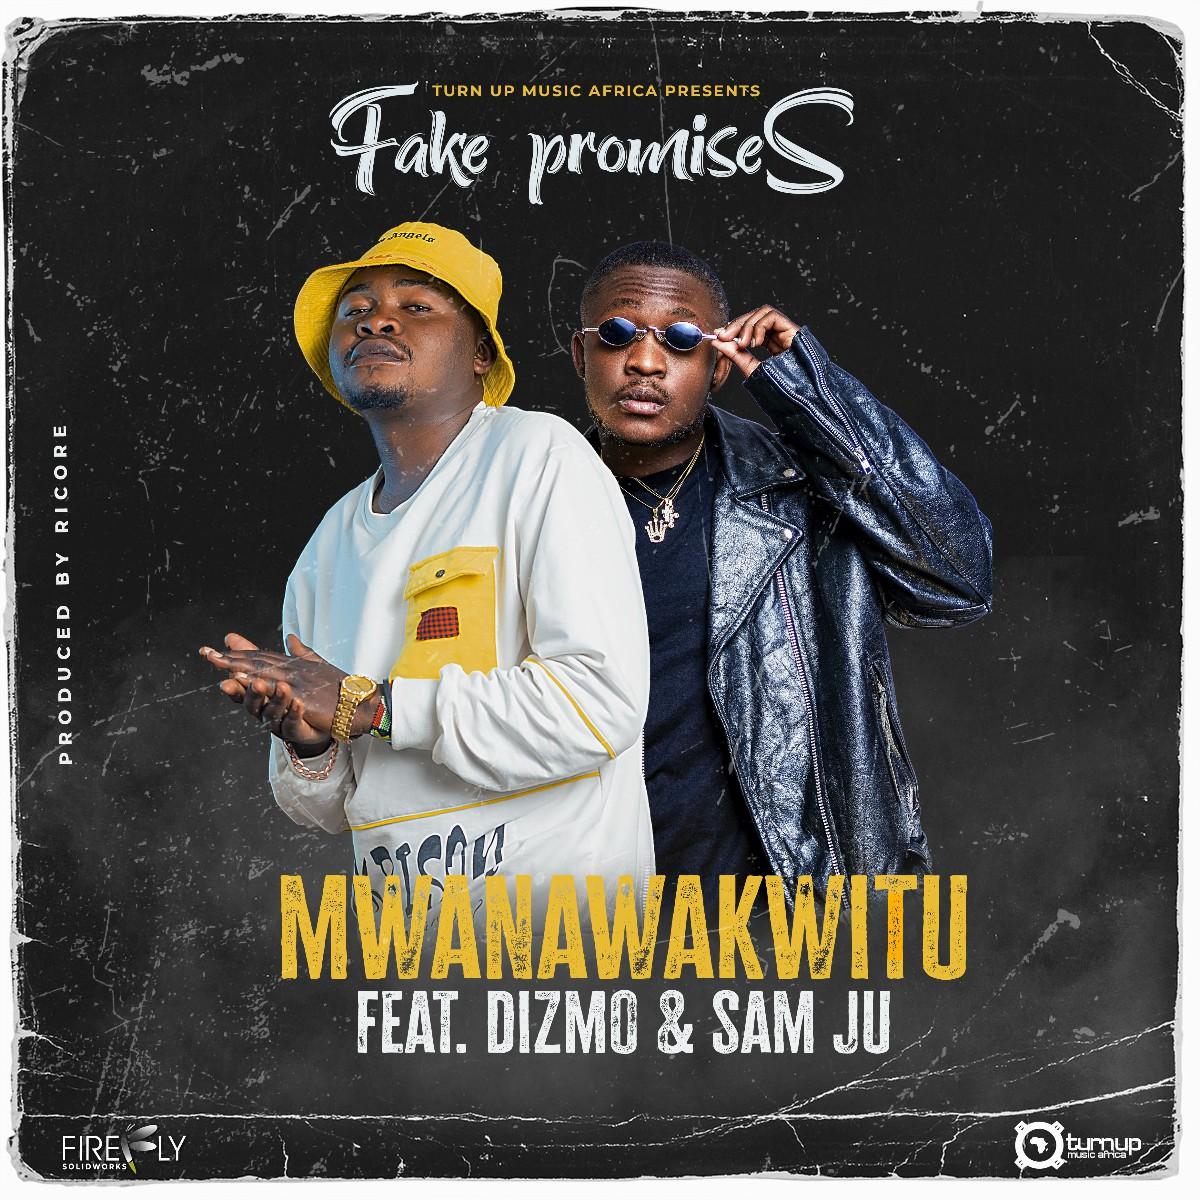 Mwana Wakwitu ft. Dizmo & Sam Ju - Fake Promises